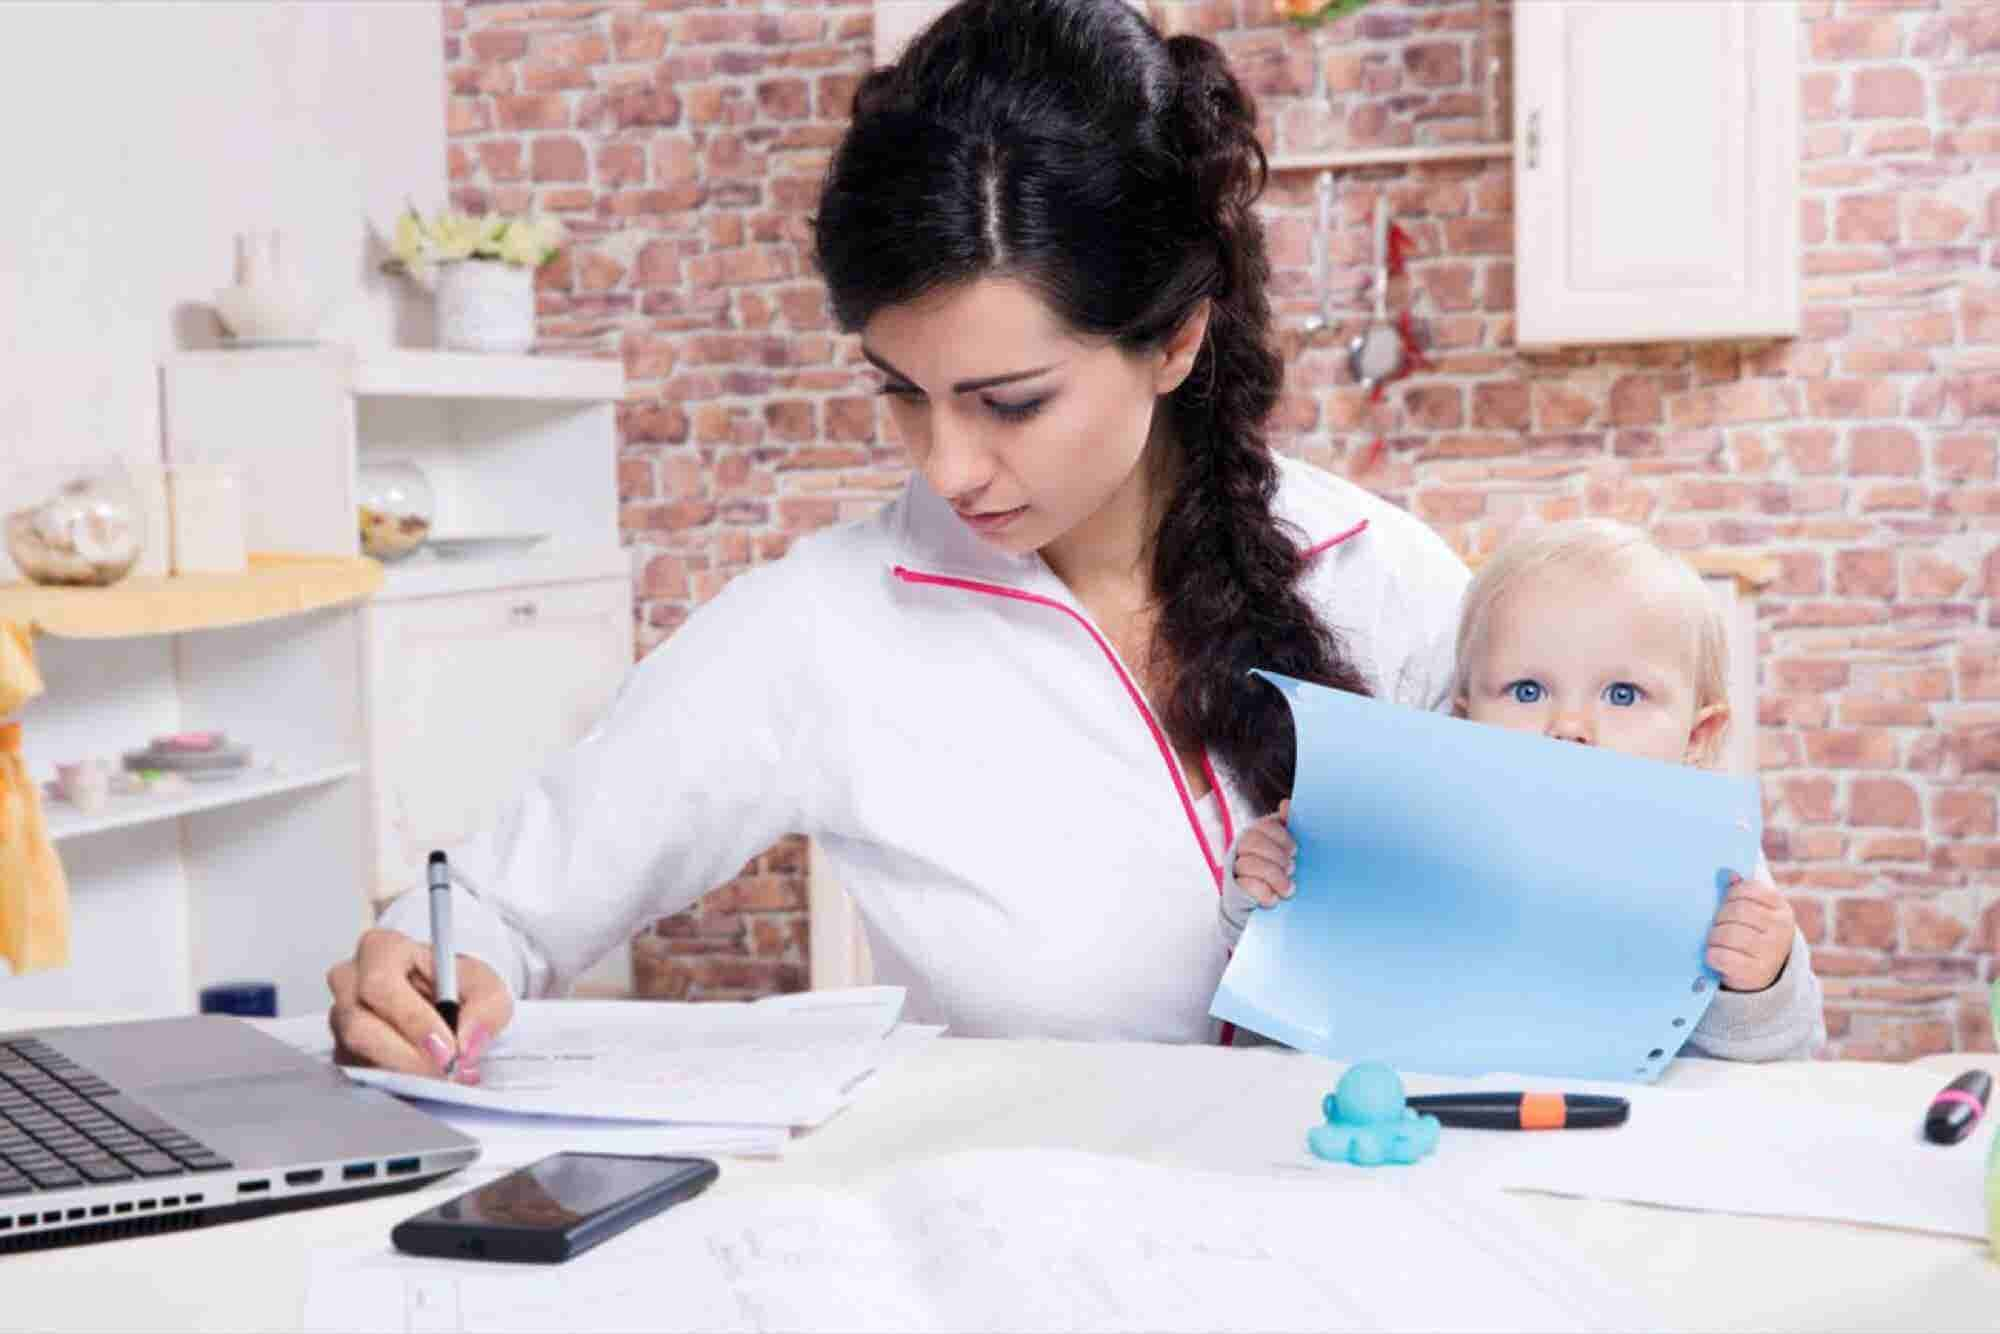 4 Ways Startup Employers Fail at Work-Life Balance